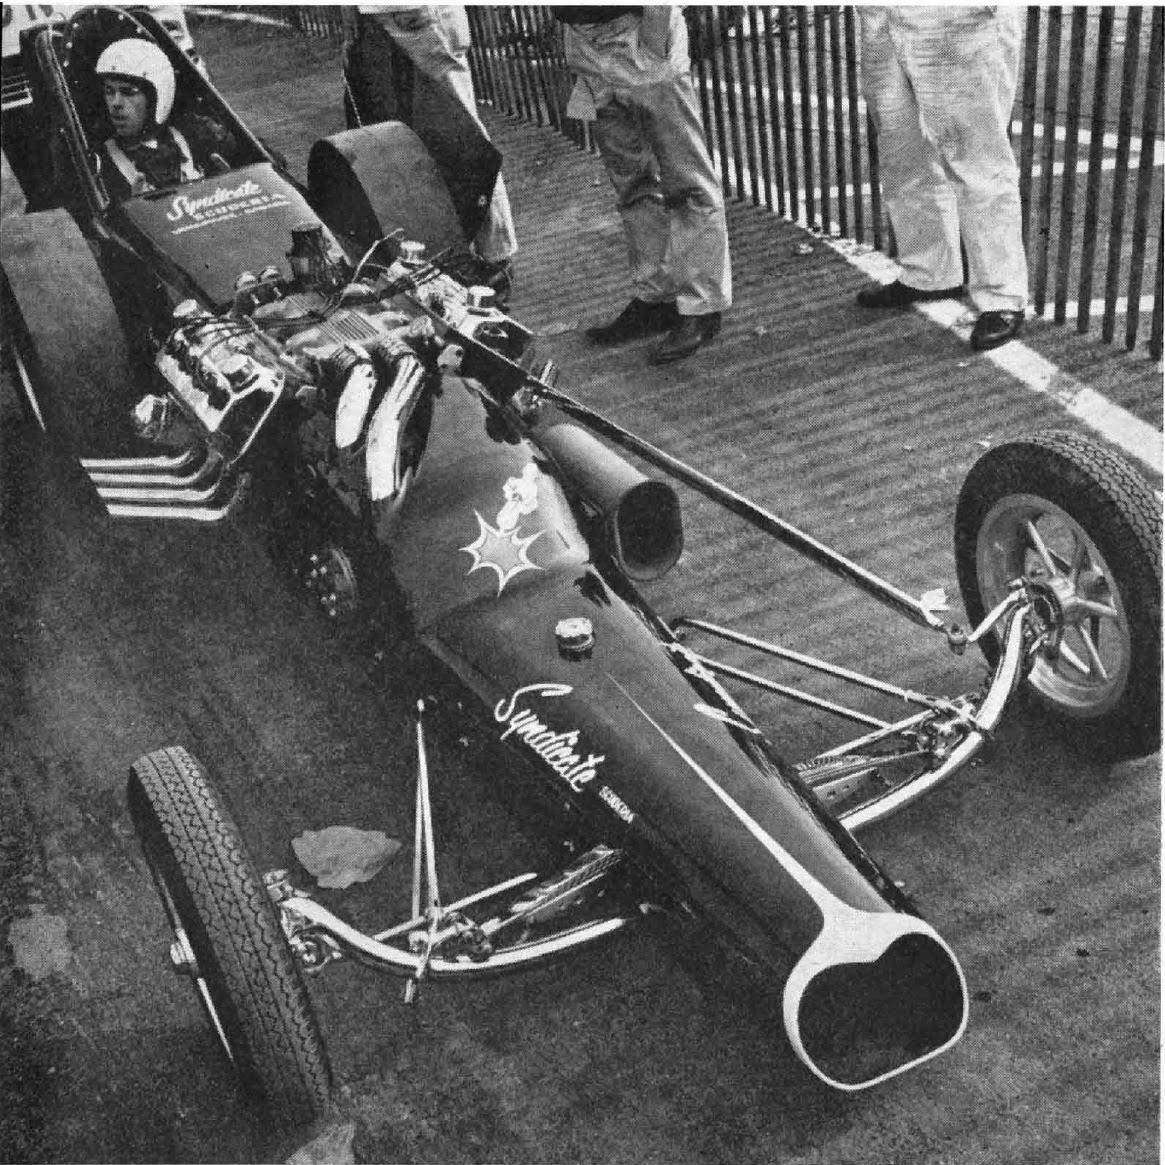 jack williams winternationals car life 1963 1.jpg